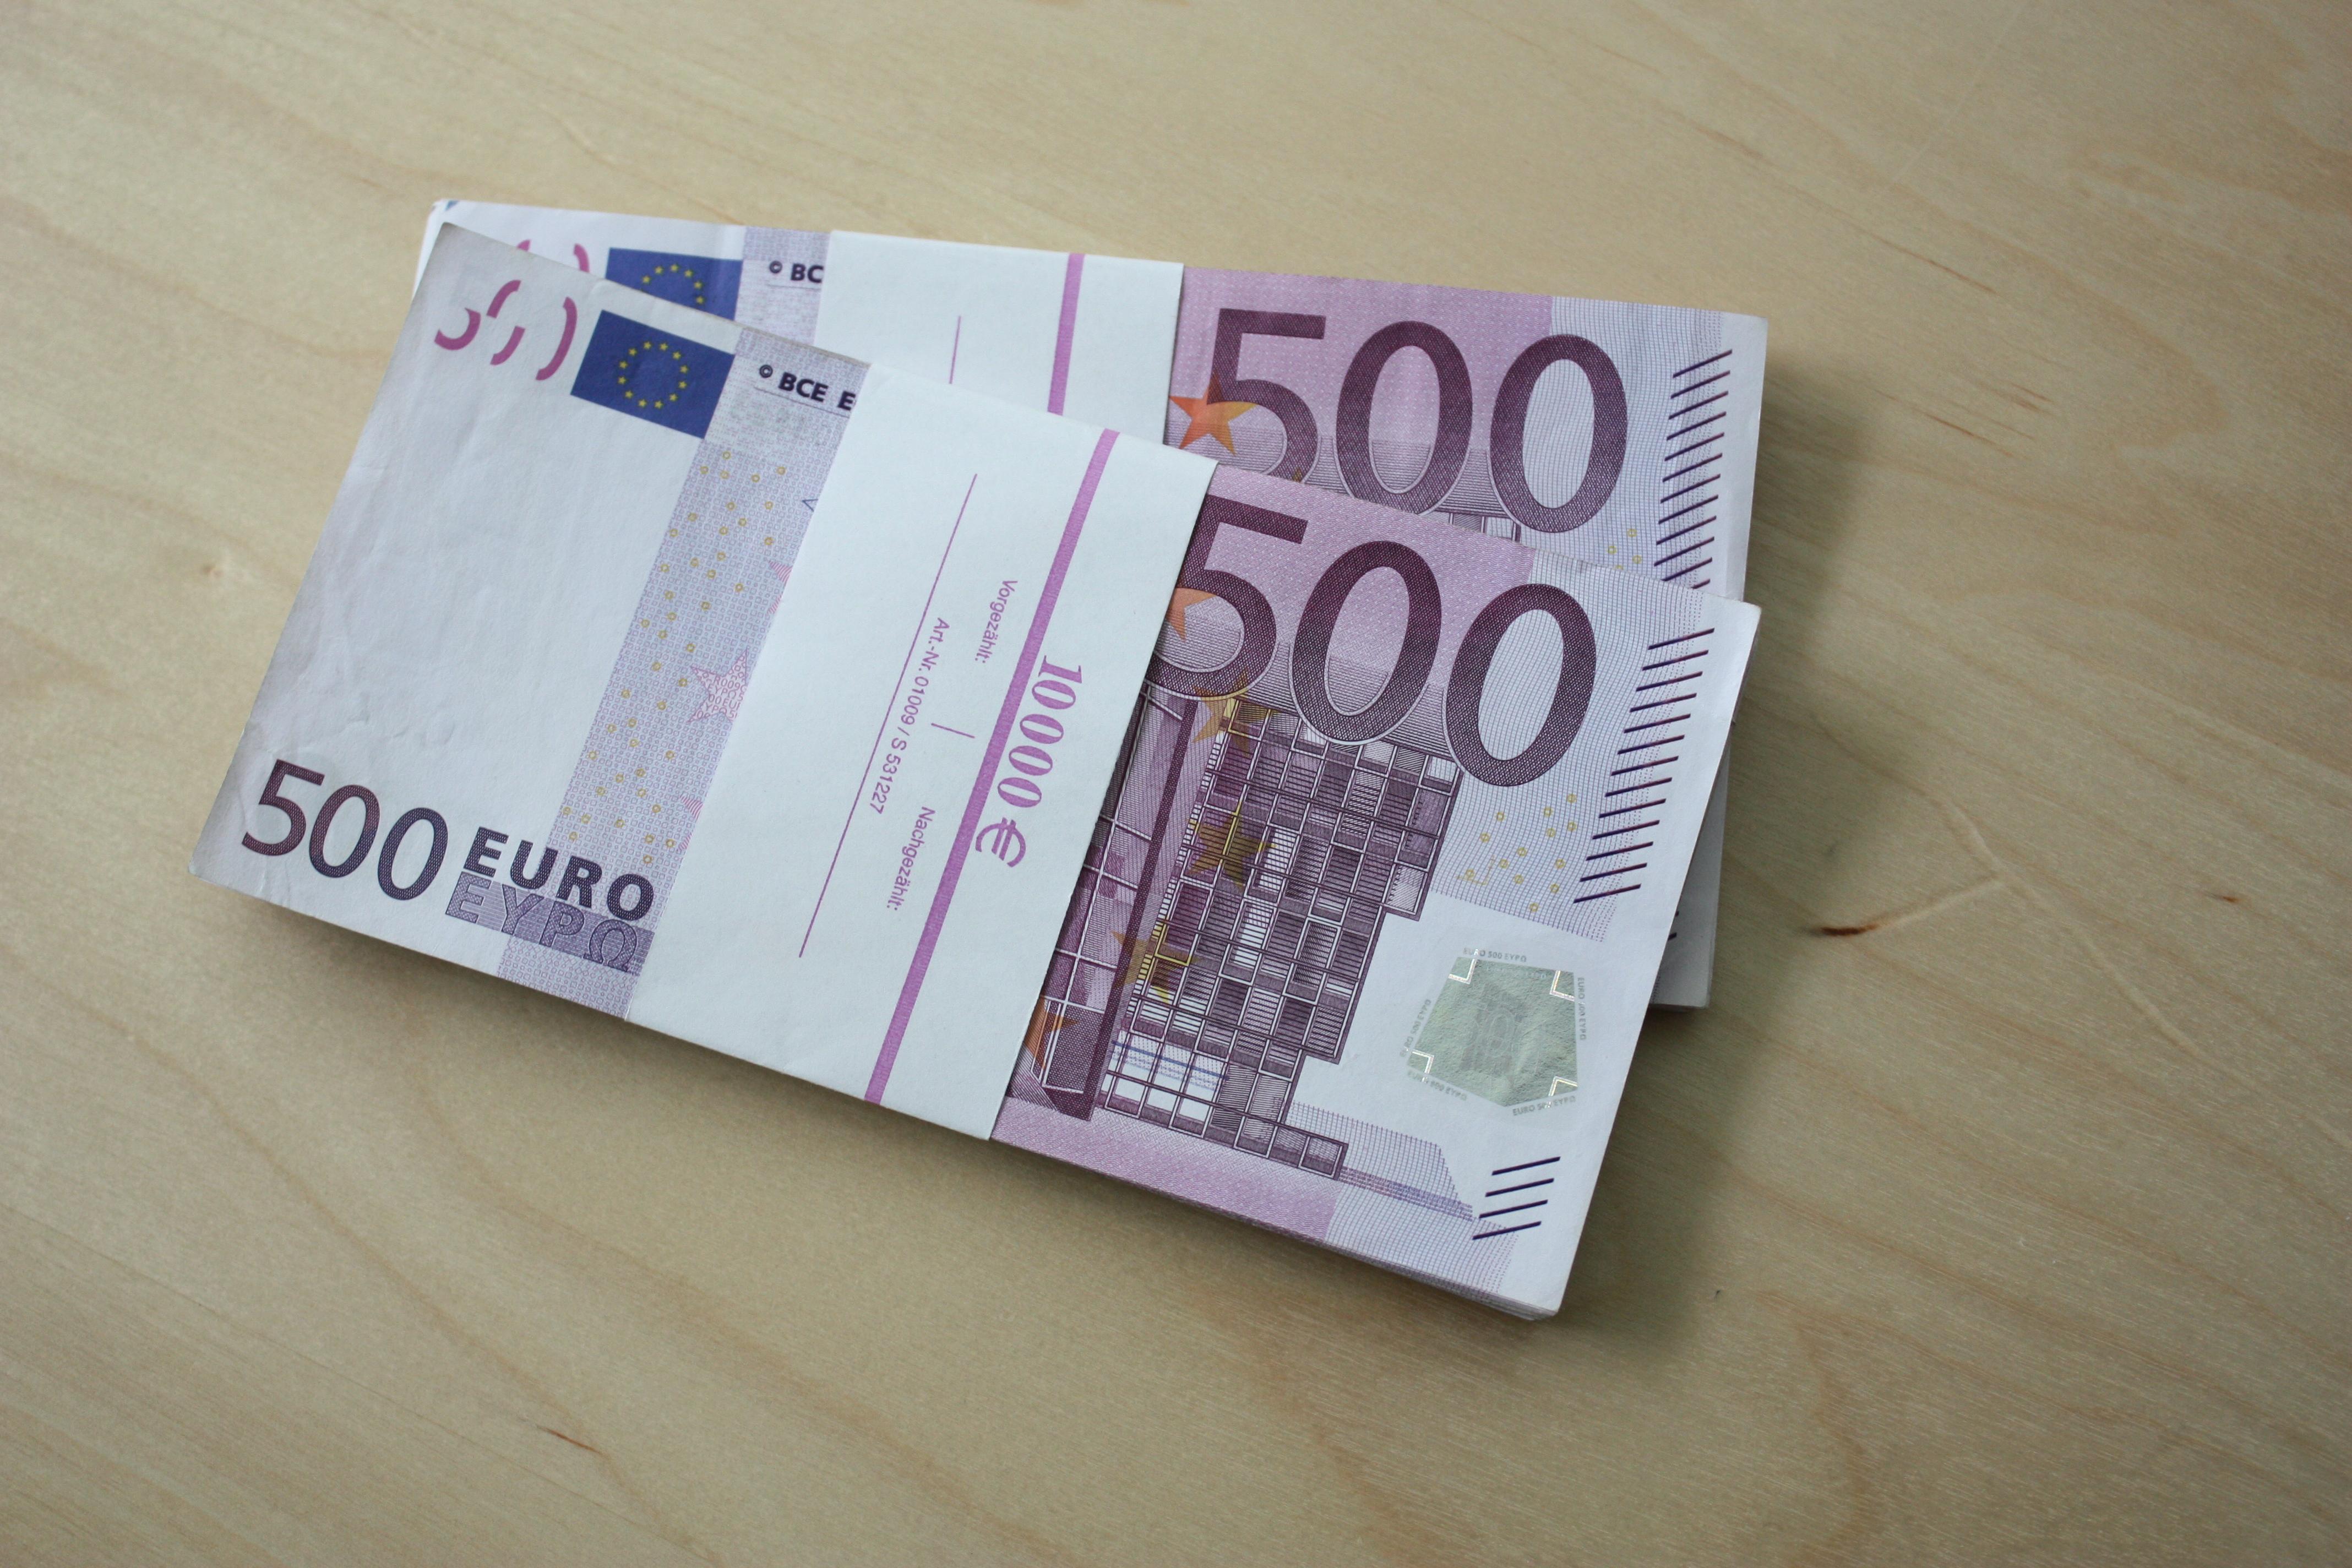 File:500 Euro Scheine 20000 Euro a.JPG - Wikimedia Commons